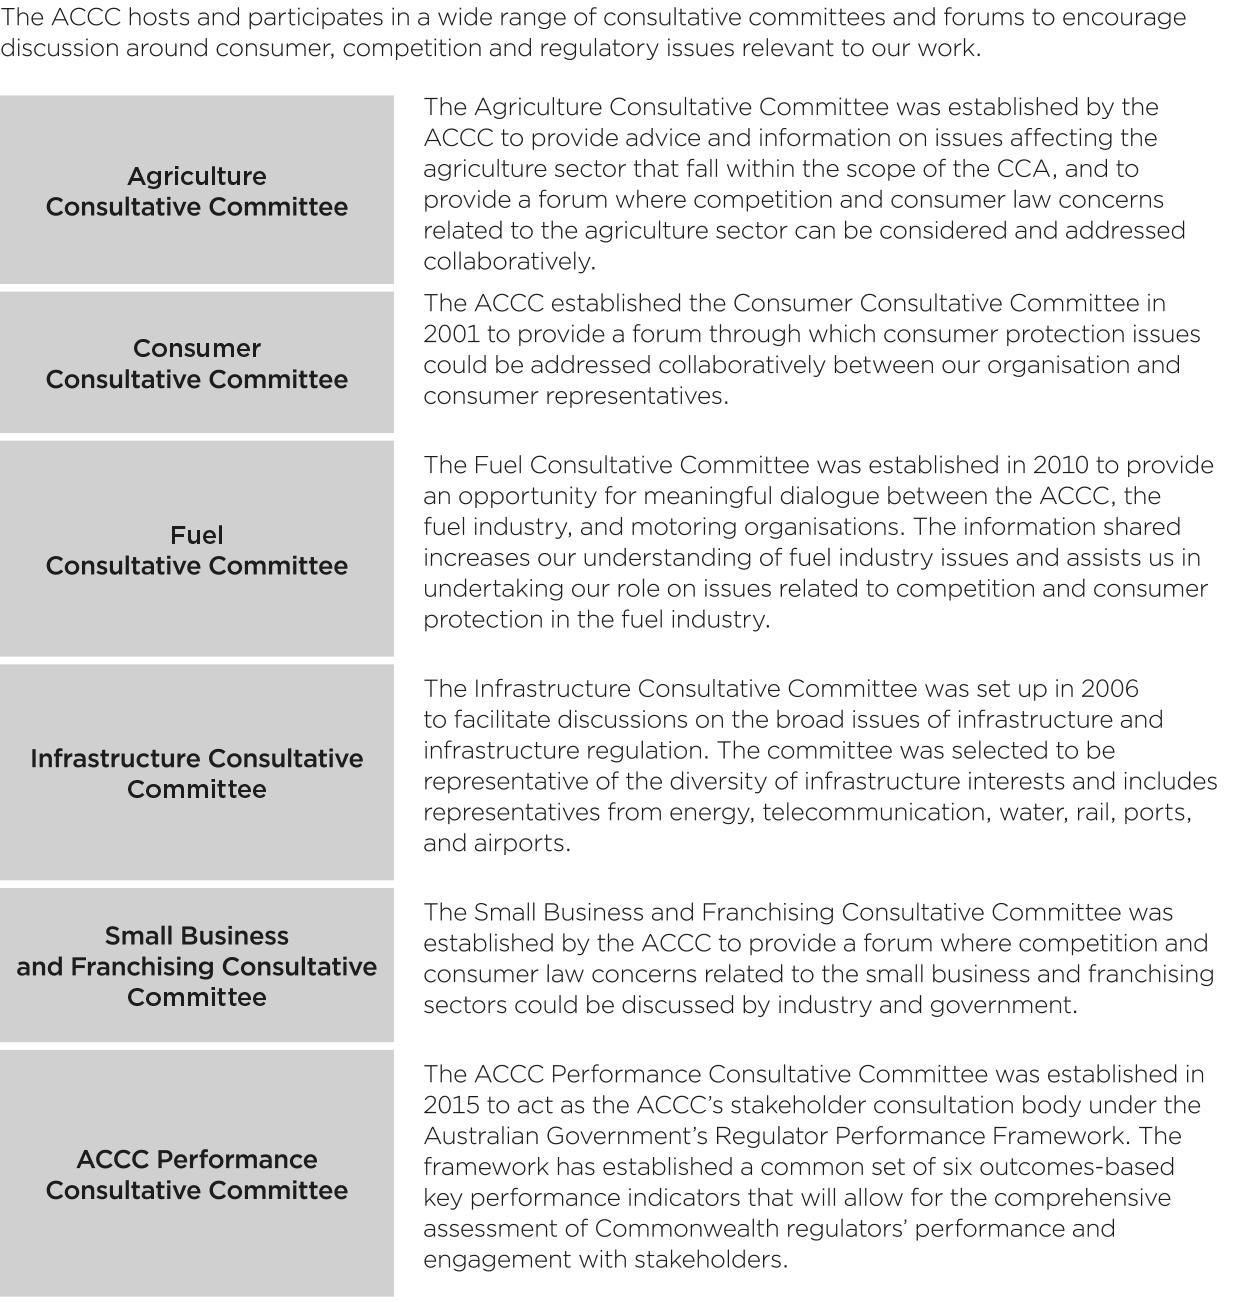 ACCC & AER annual report 2017-18 | ACCC